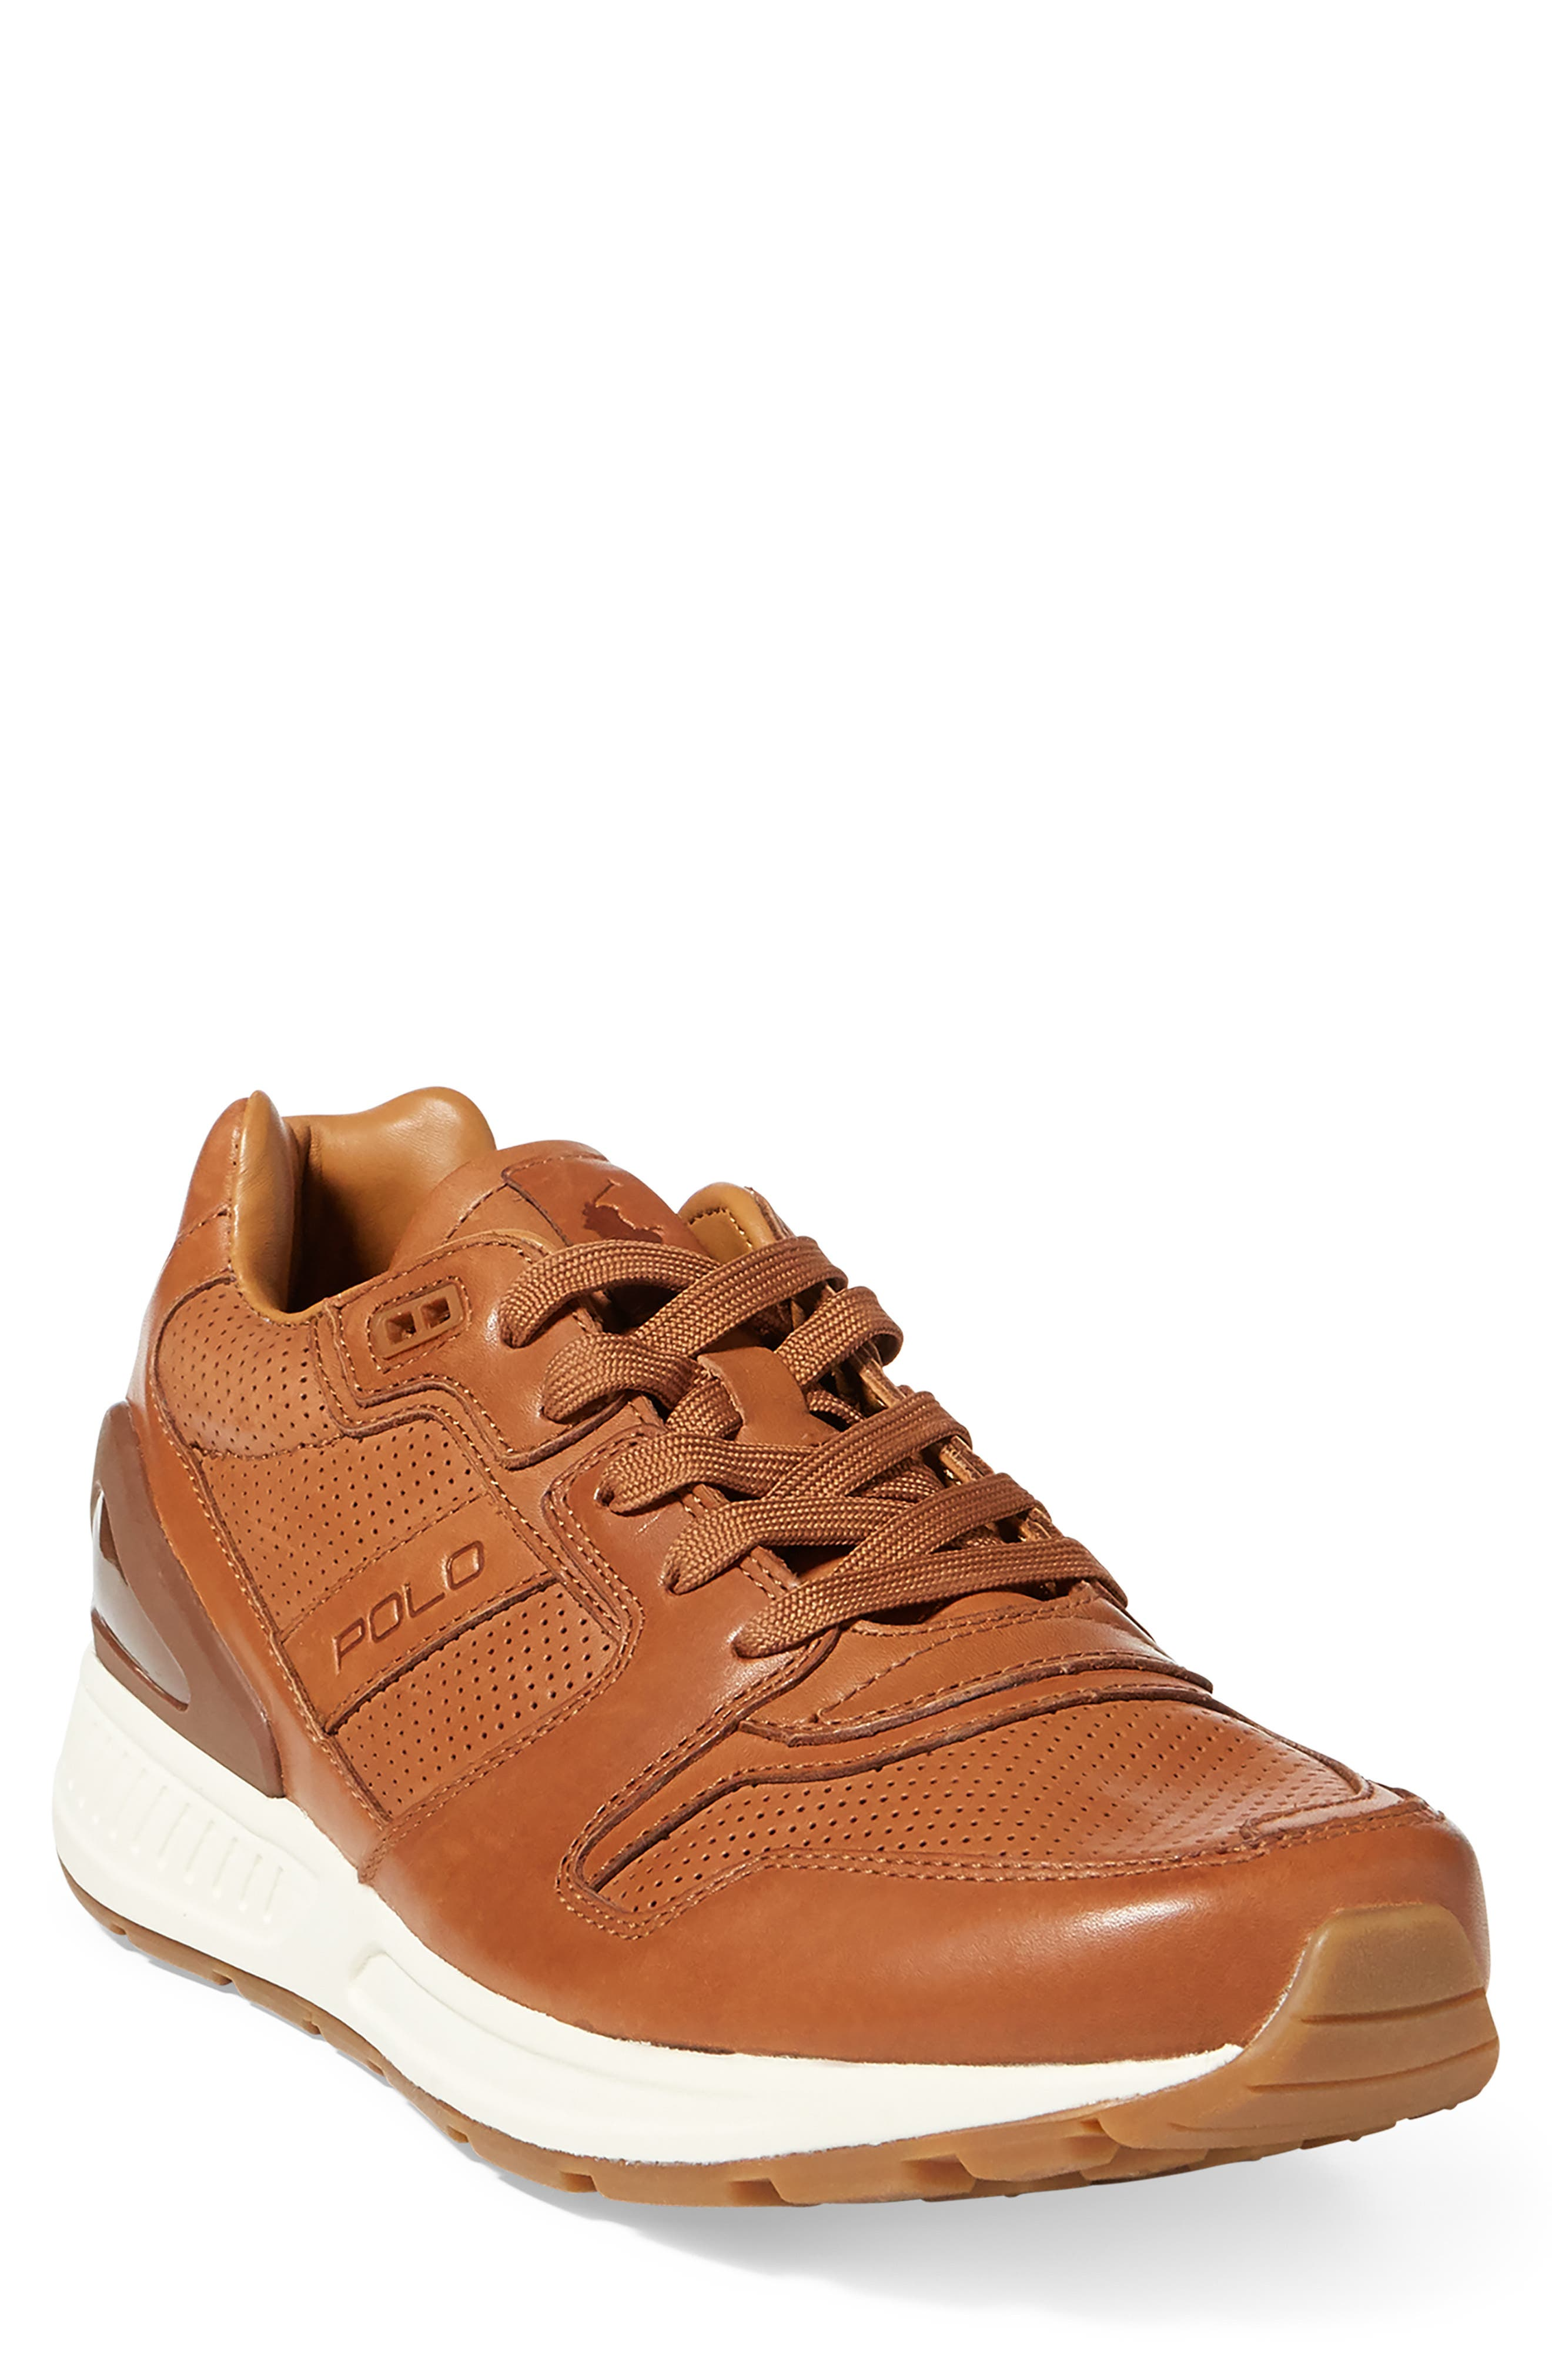 Polo Ralph Lauren Train 100 Sneaker (Men)